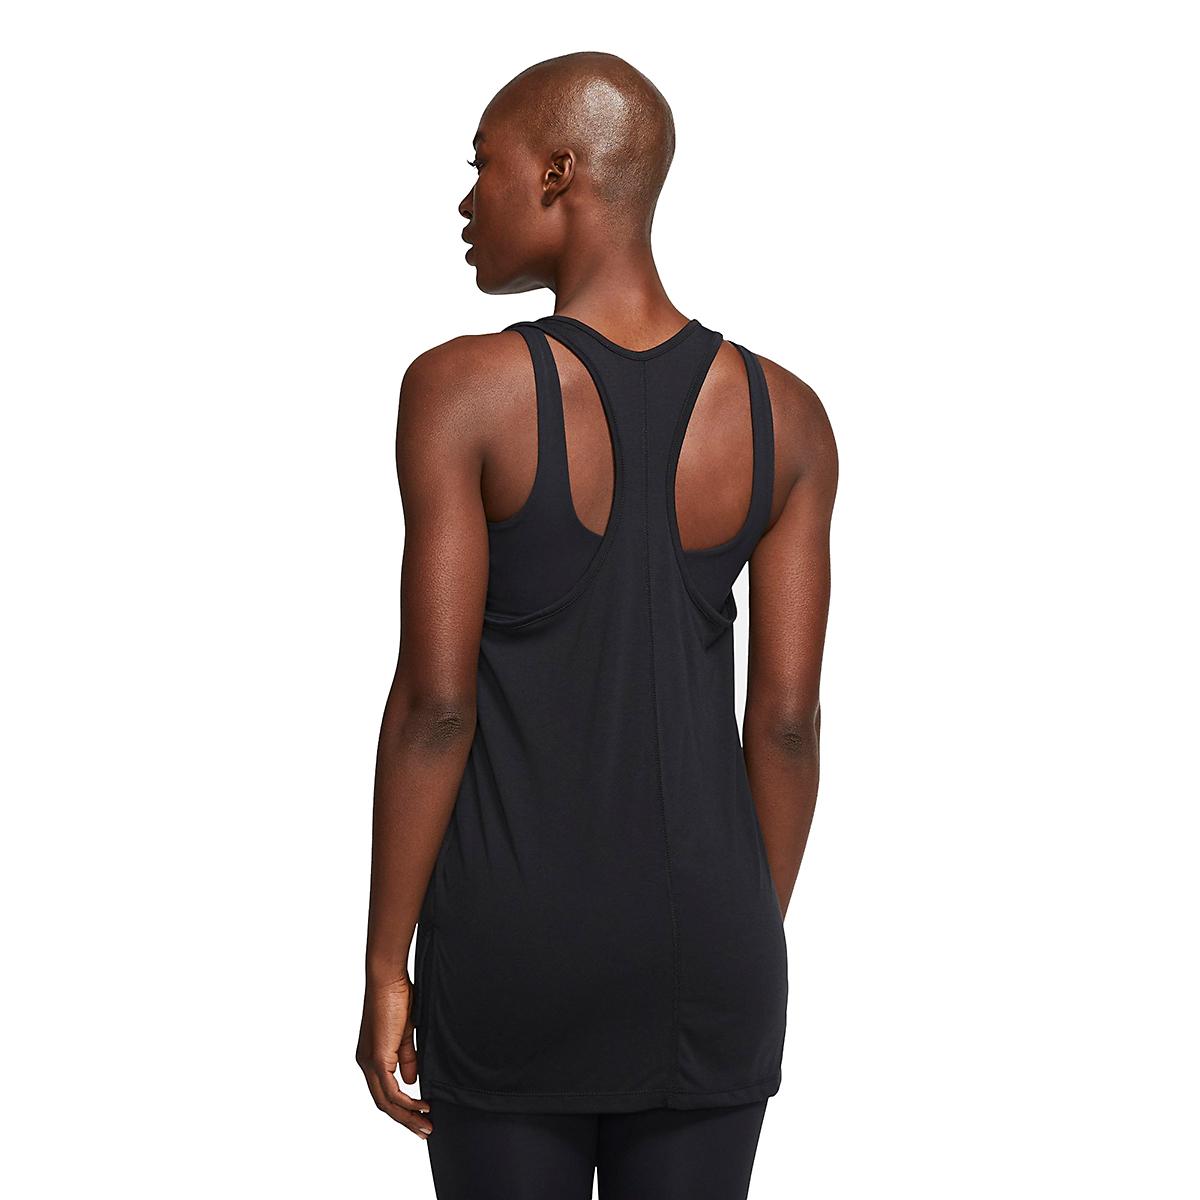 Women's Nike Yoga Layer Tank - Color: Black/Dark Smoke Grey - Size: XS, Black/Dark Smoke Grey, large, image 4